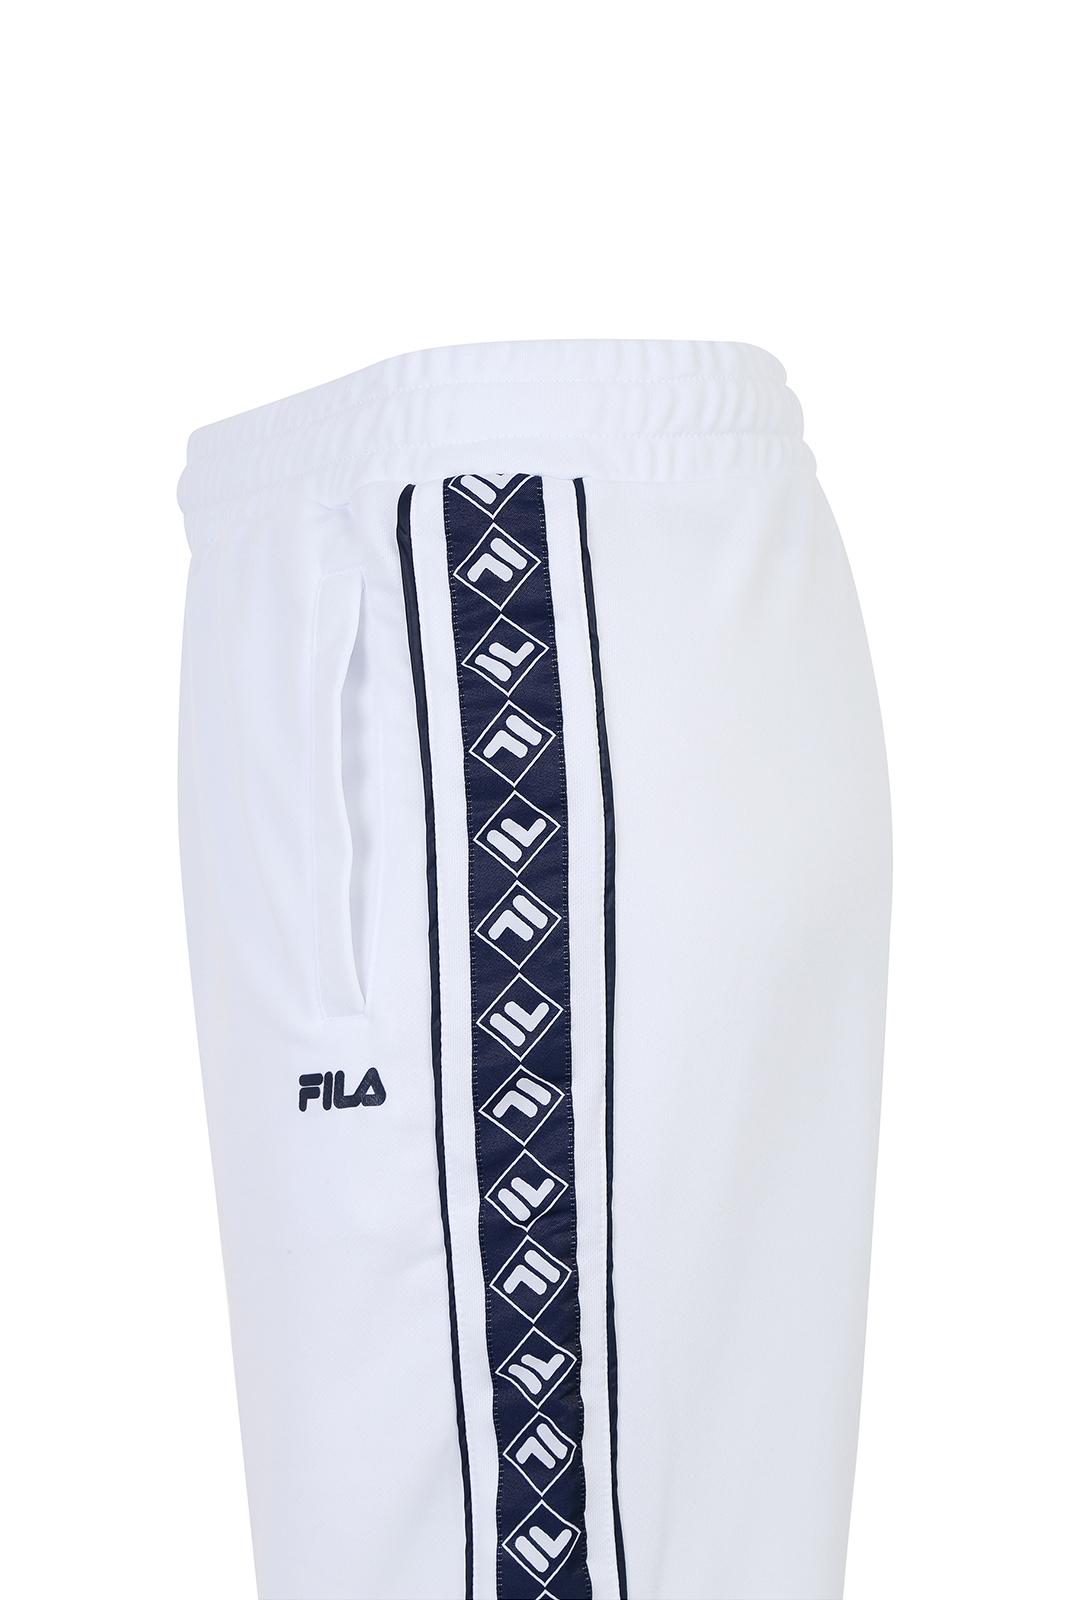 Pantalons  Fila 687164 ralrh M67 BRIGHT WHITE